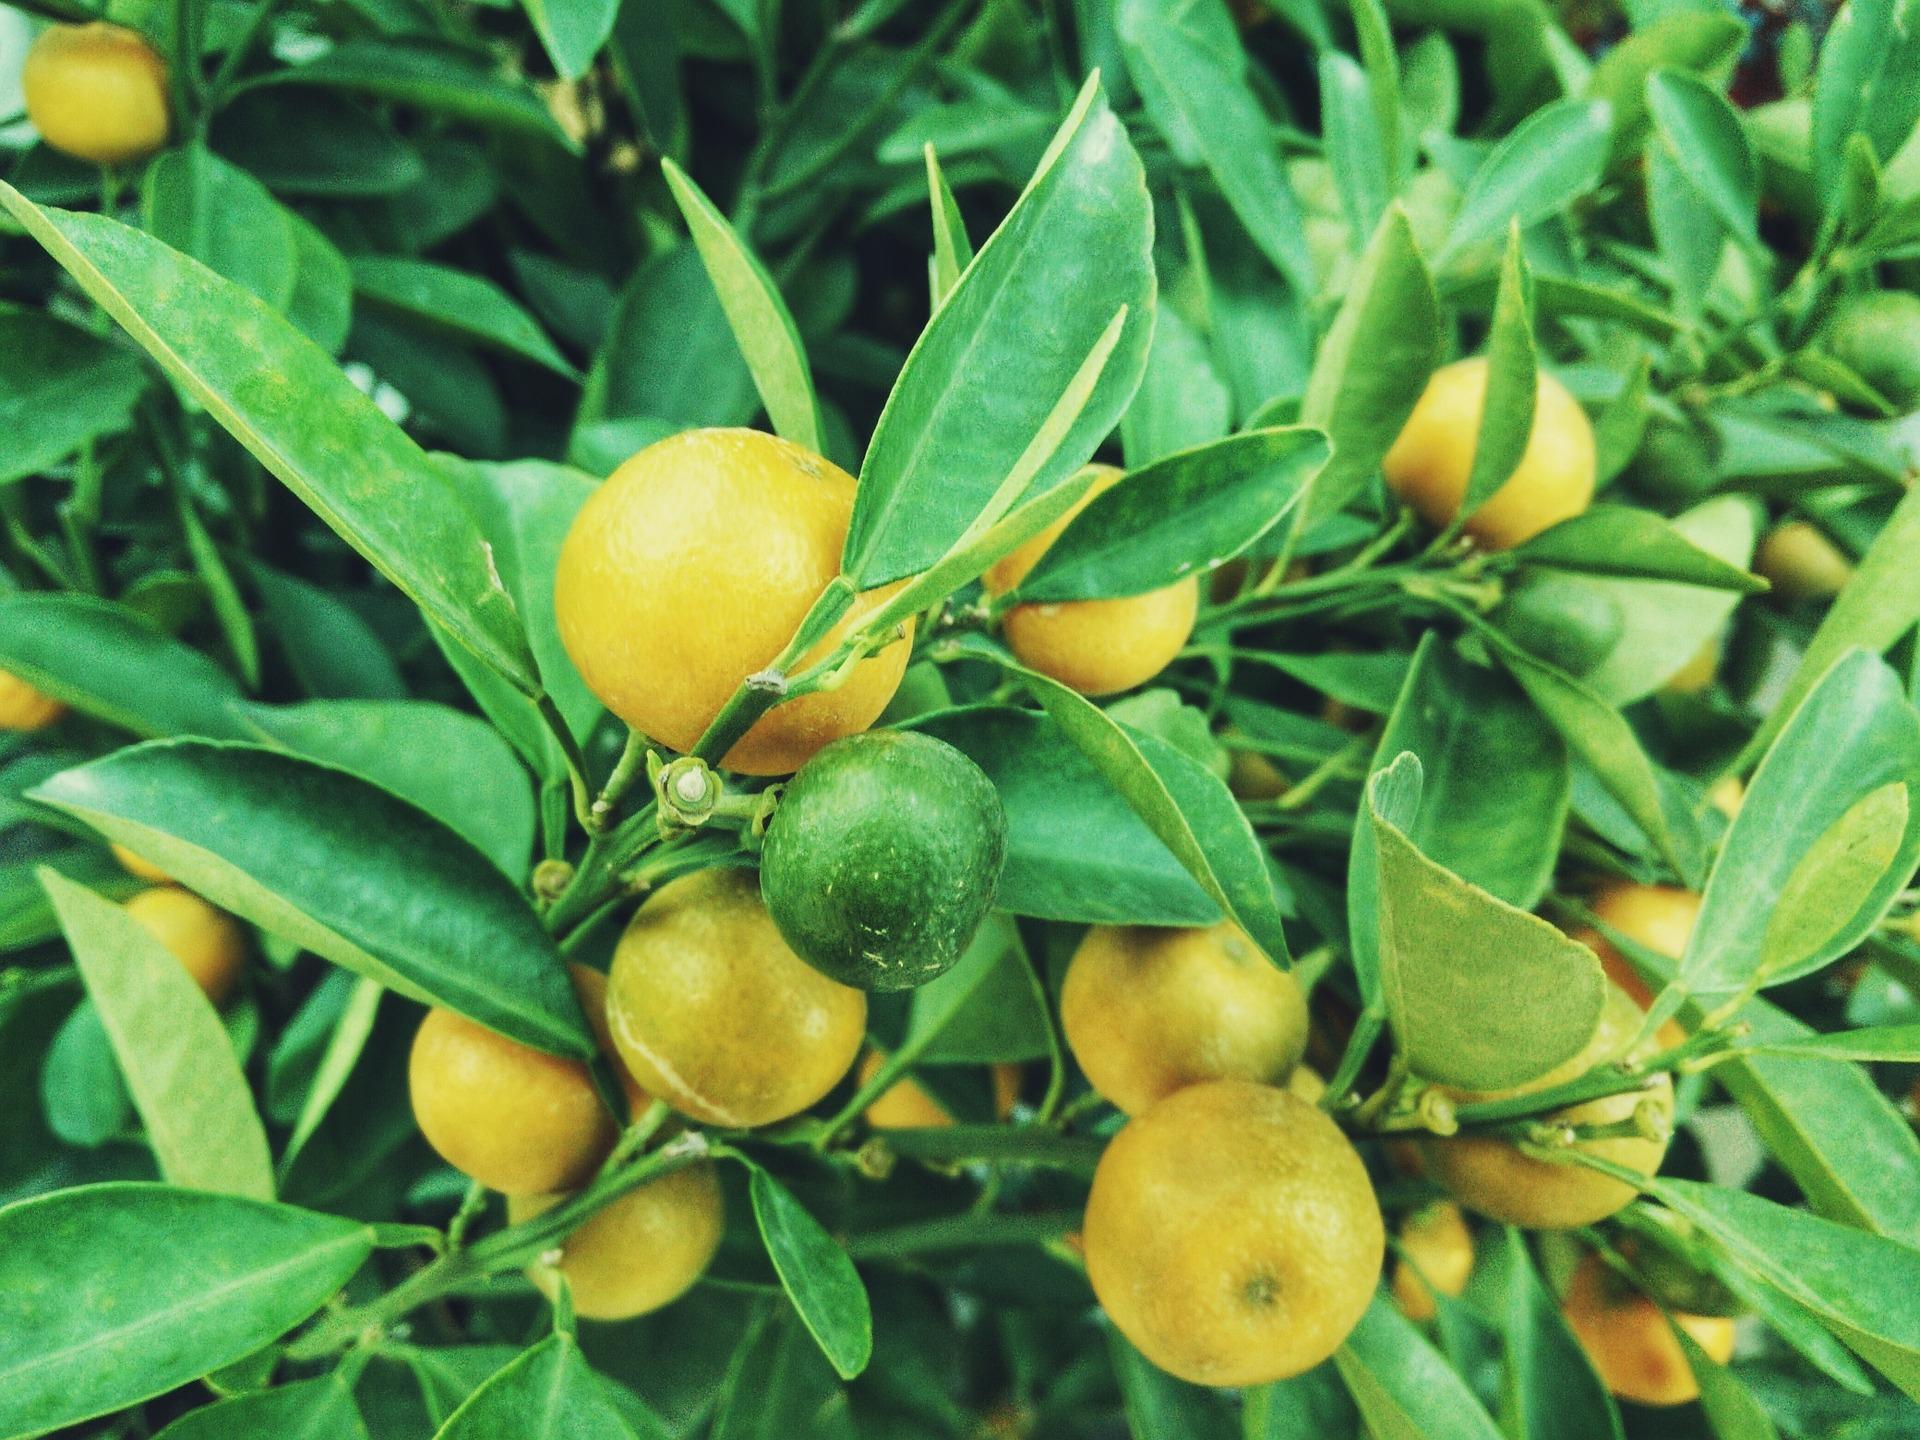 lemons1149003_1920